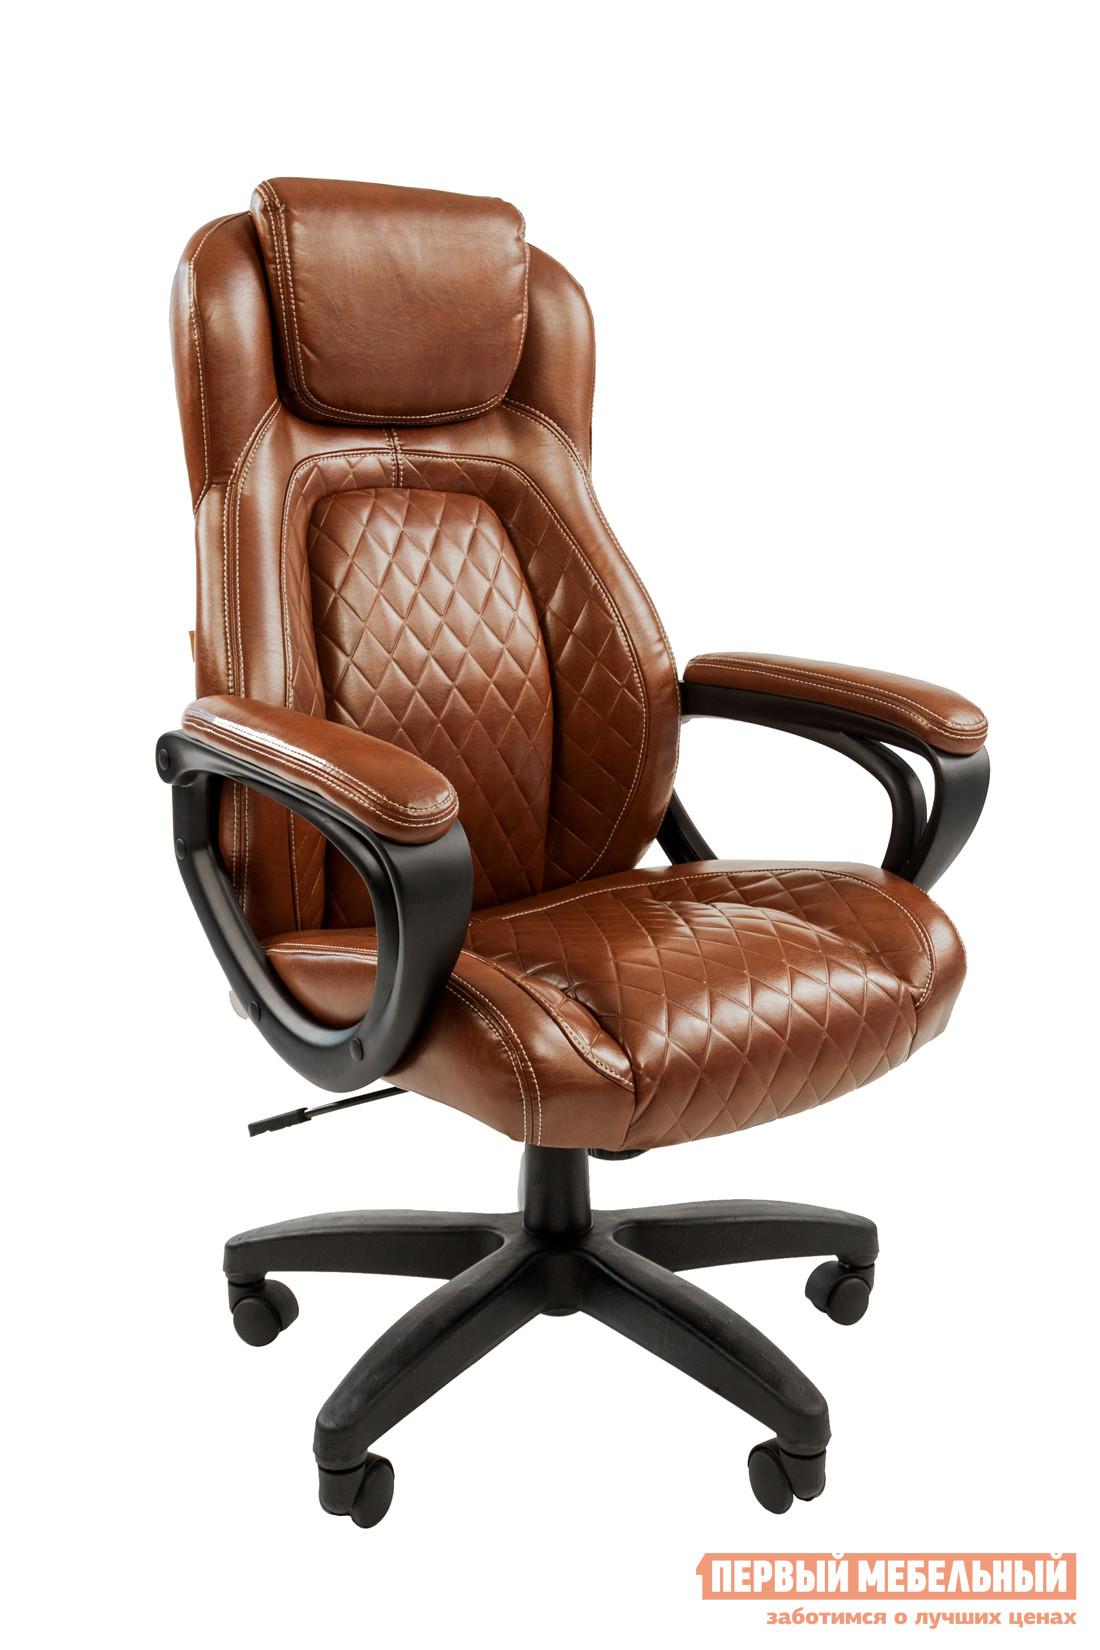 Кресло руководителя Тайпит Chairman 432 дверь тайпит omd 43 1